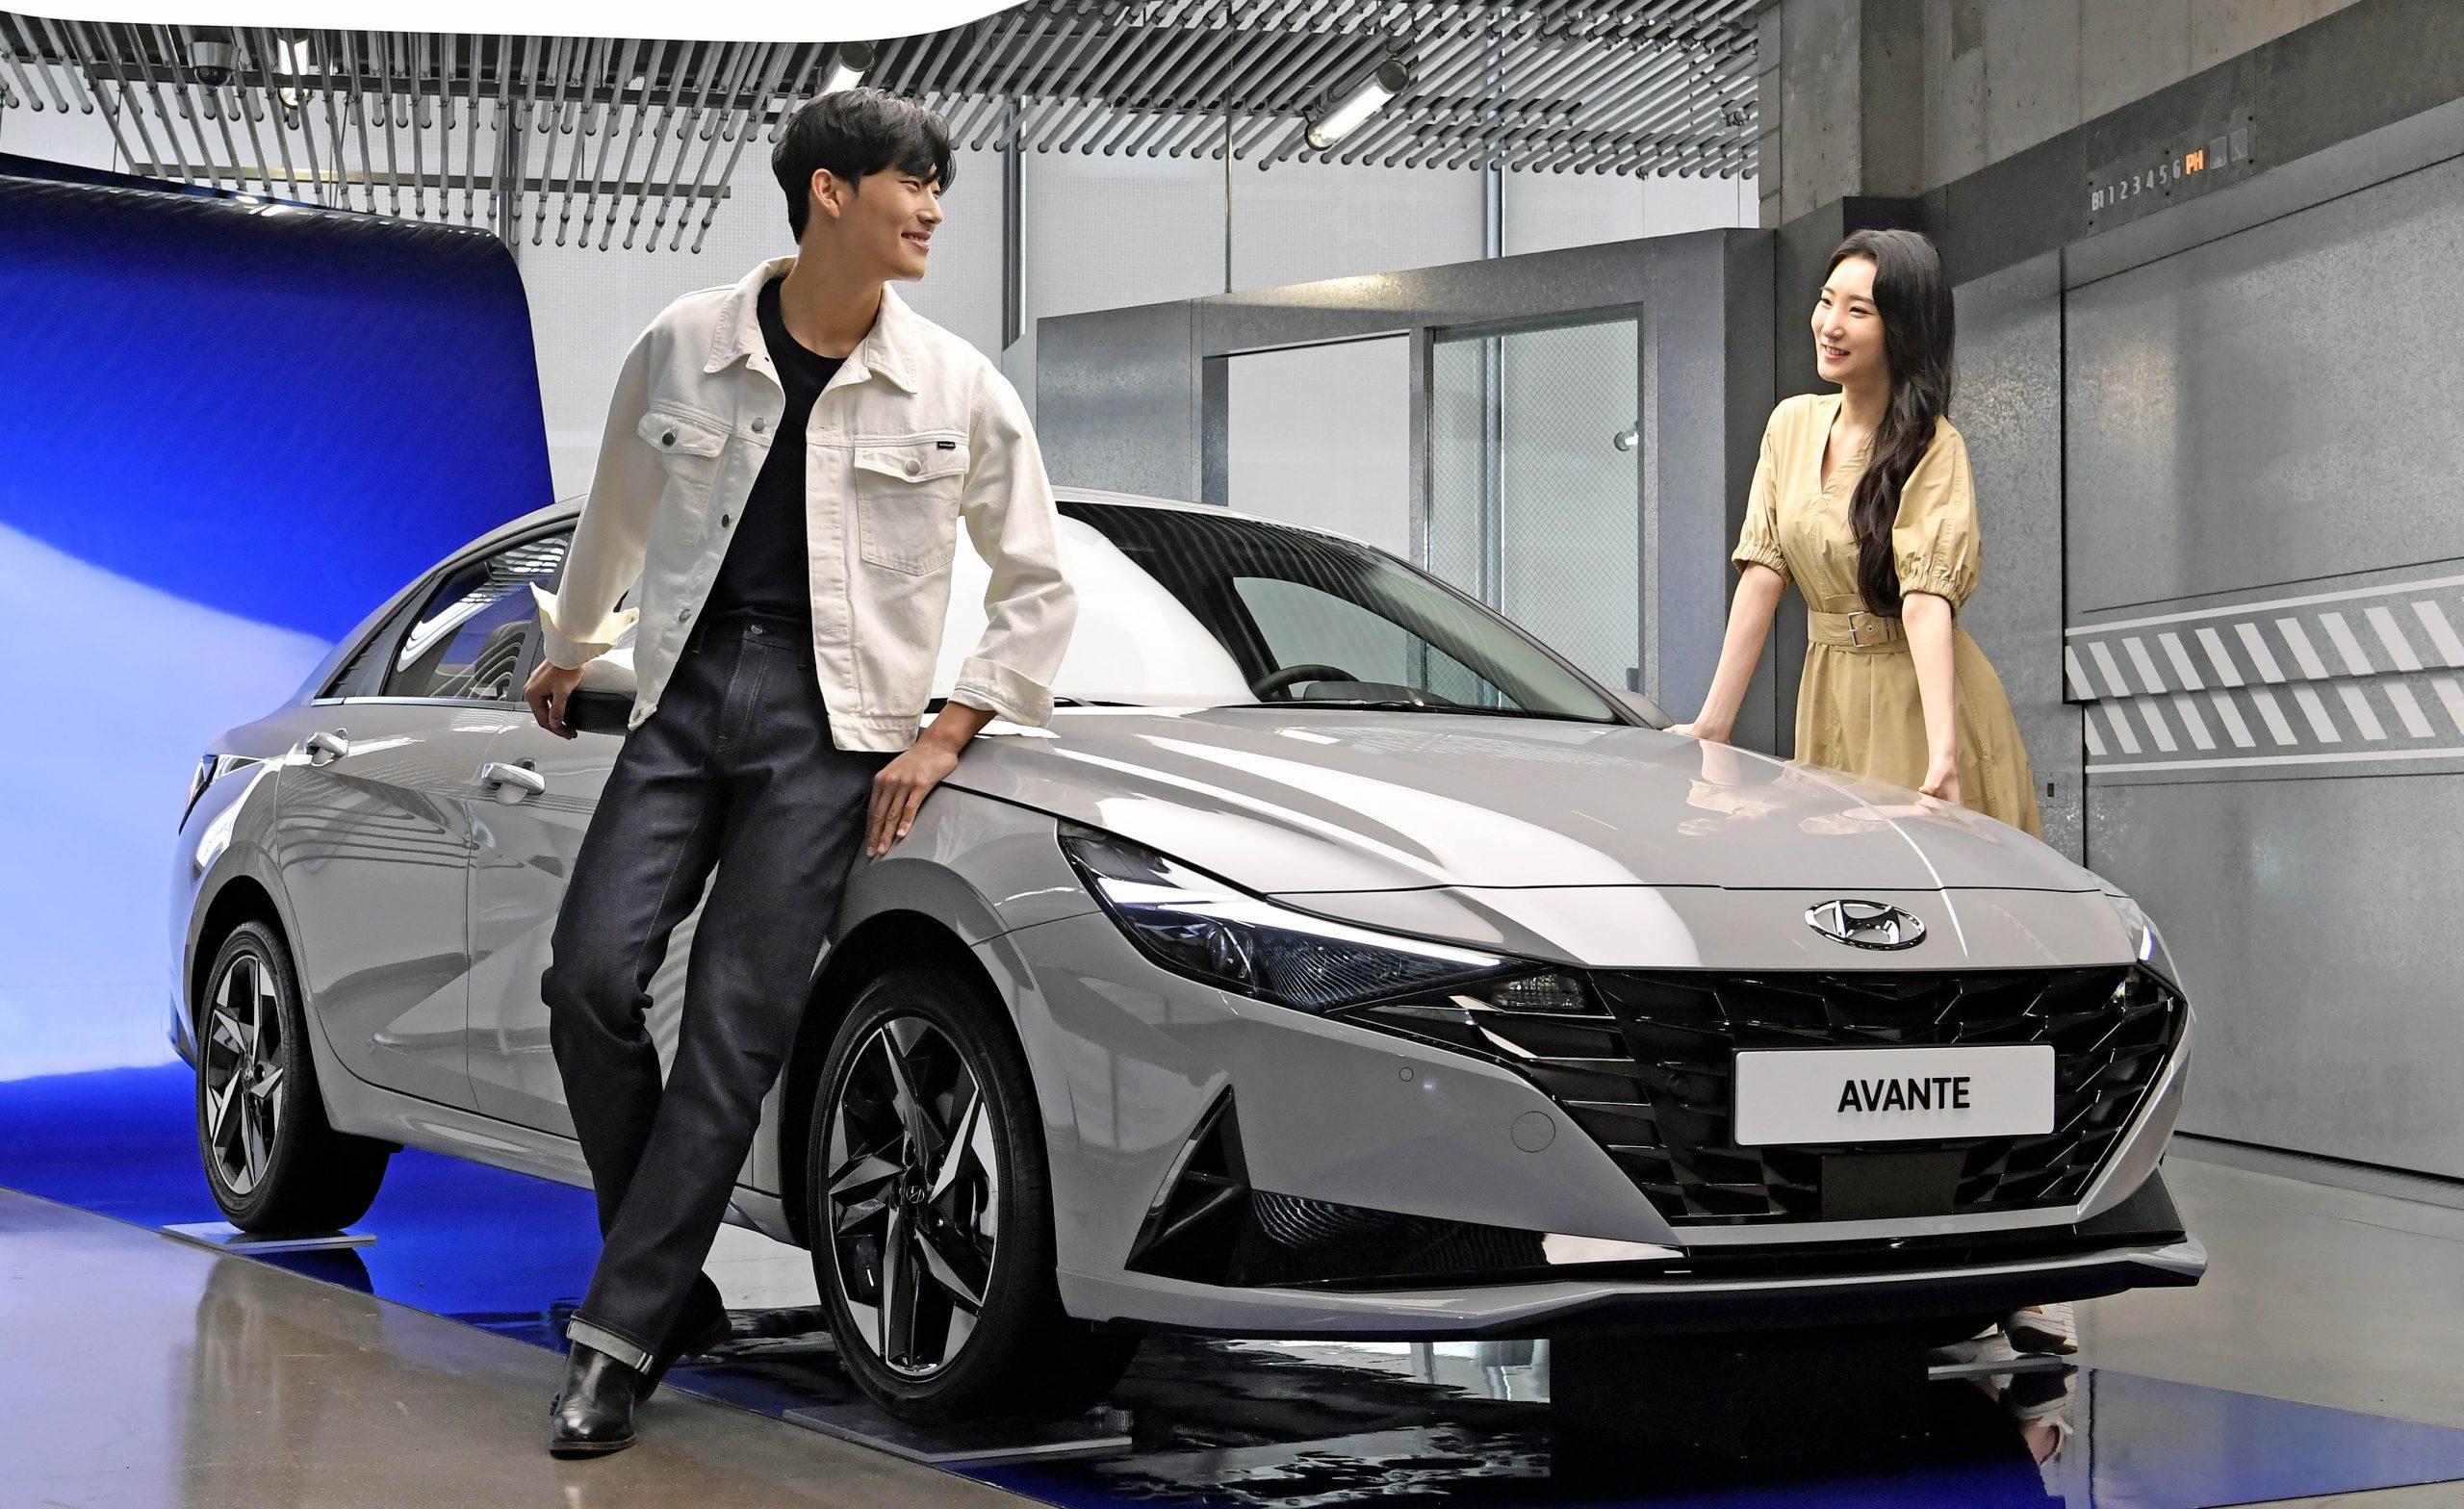 All New Hyundai Avante (Elantra) Debuts in South Korea 4